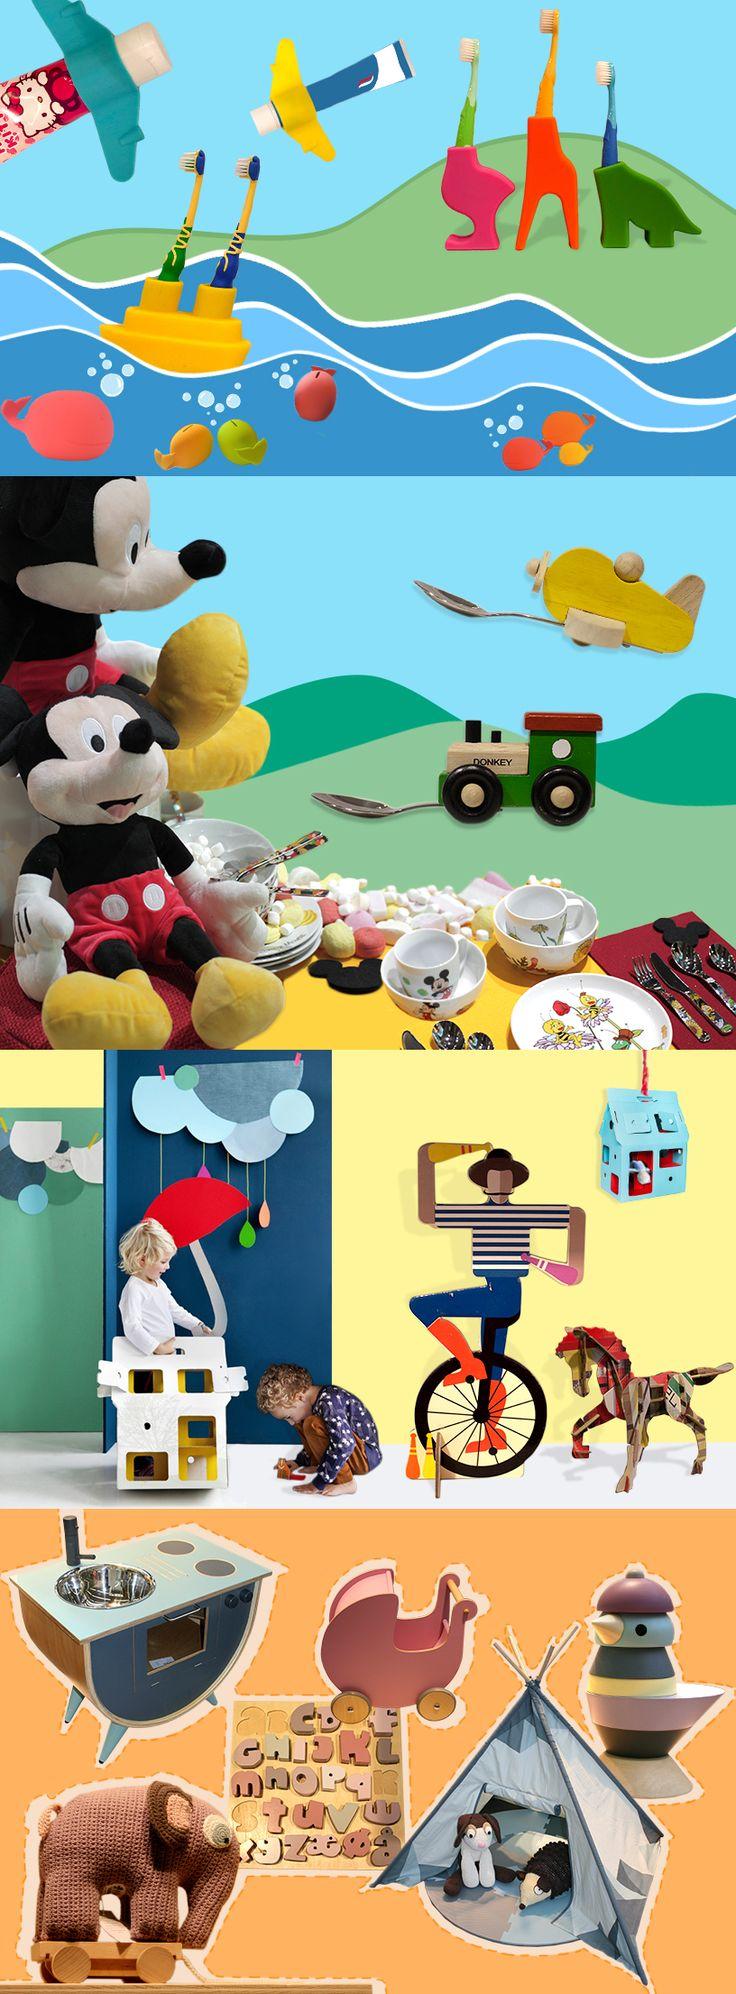 It's a Kids' World – designs to stir the imagination.